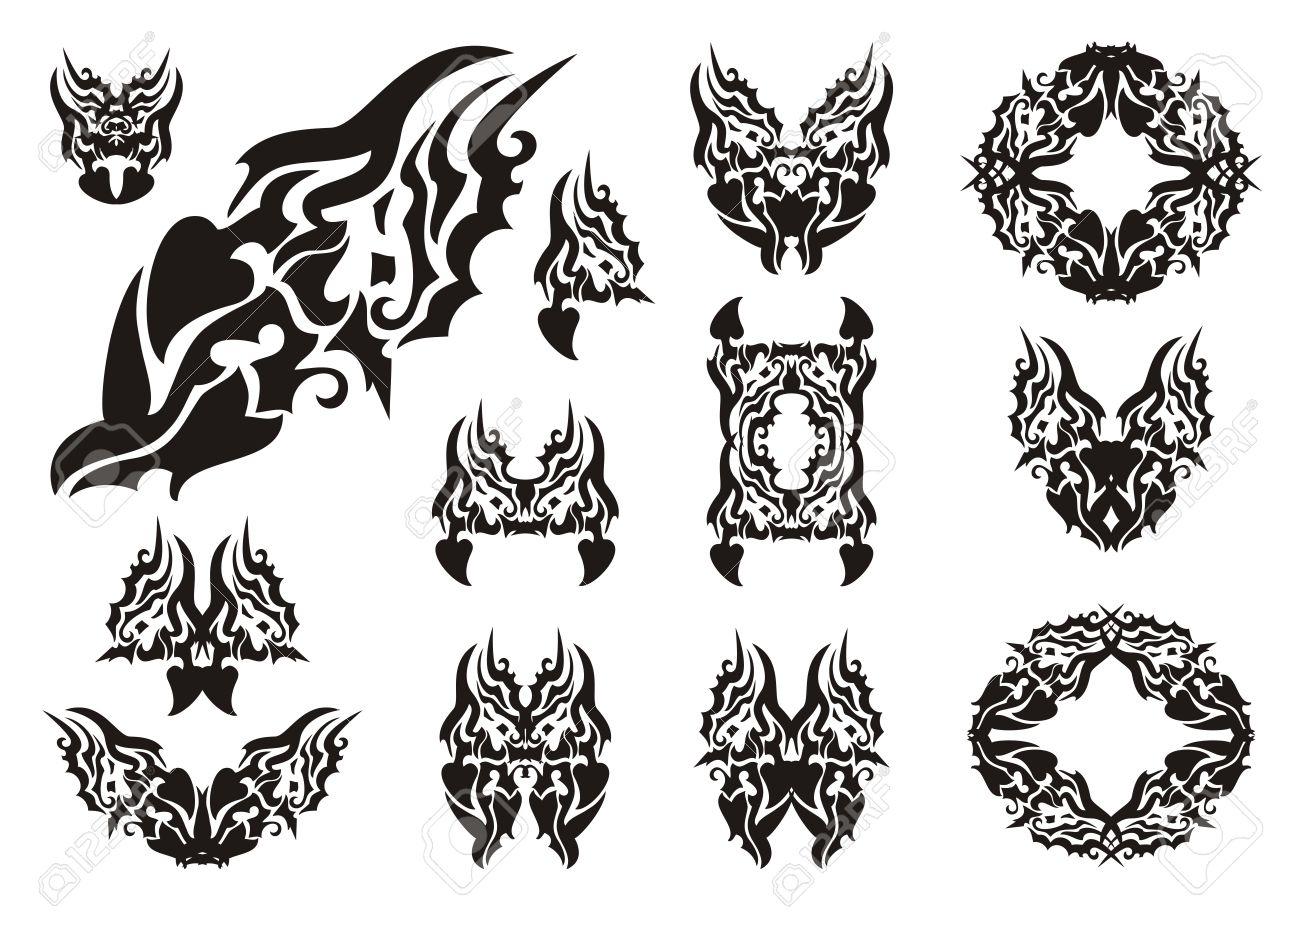 Wavy dragon symbols dangerous symbols of a dragon butterfly wavy dragon symbols dangerous symbols of a dragon butterfly of a dragon and dragon biocorpaavc Image collections